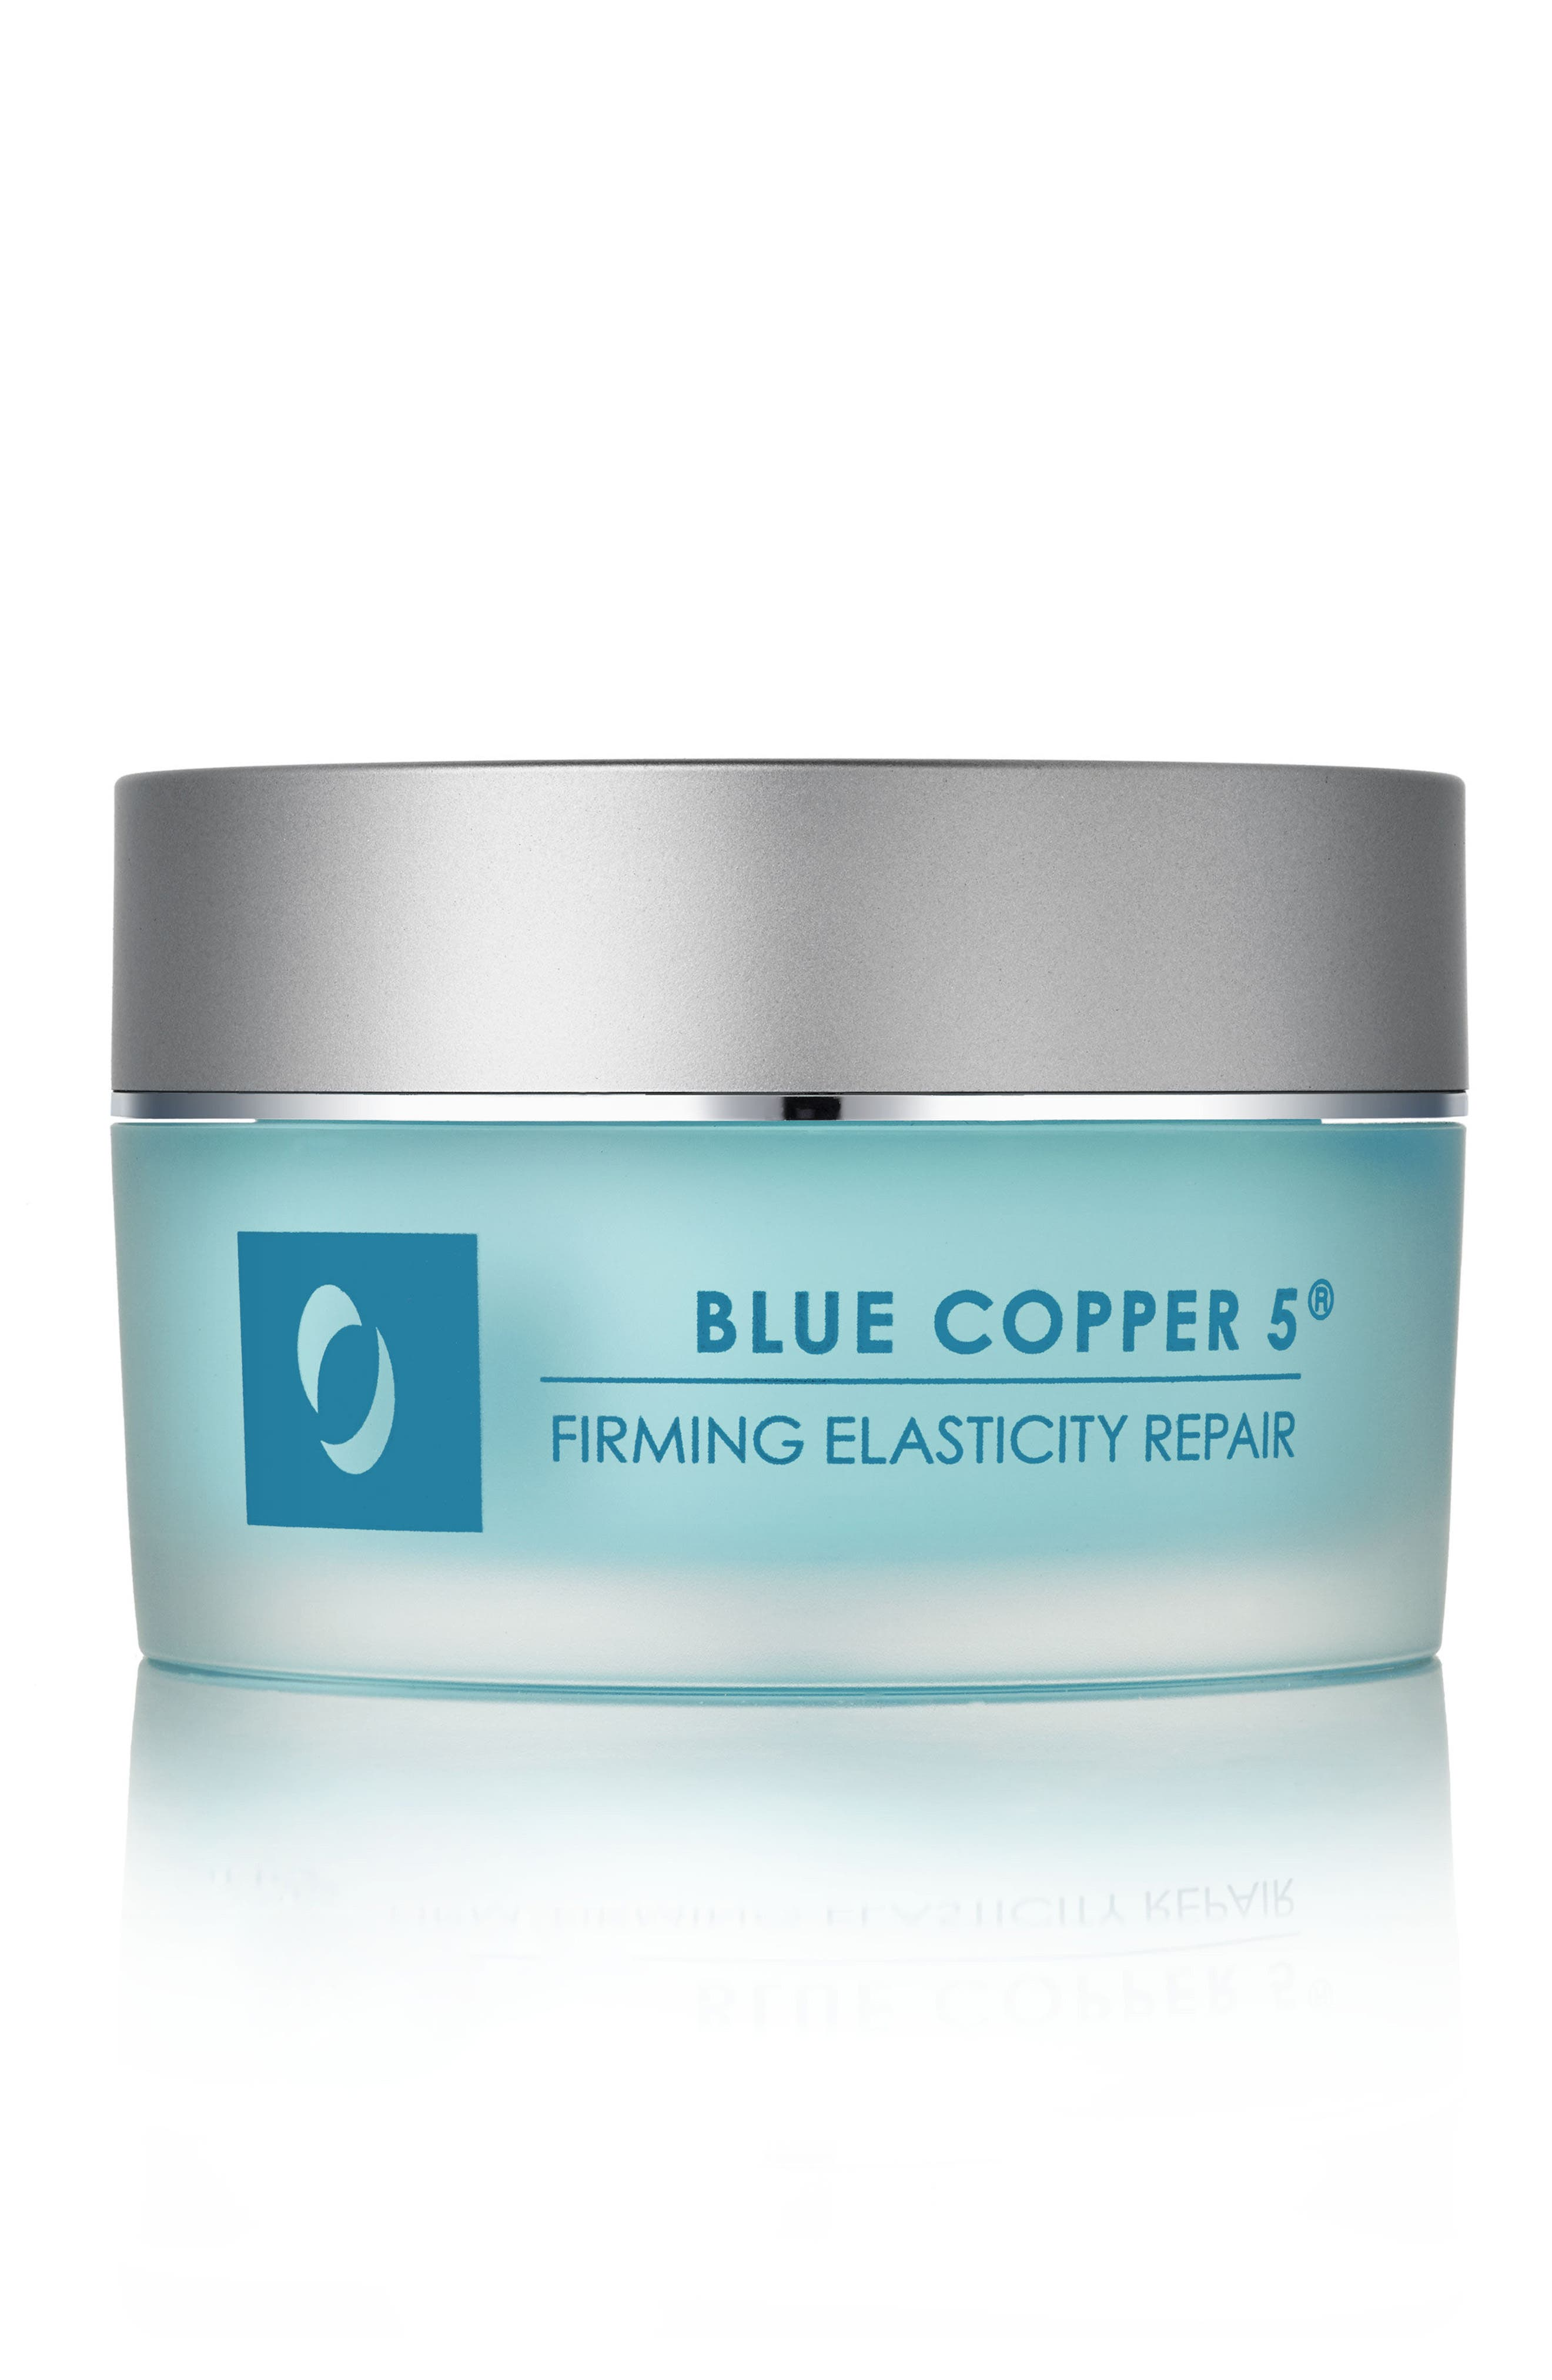 Alternate Image 1 Selected - Osmotics Cosmeceuticals Blue Copper 5 Firming Elasticity Repair ($450 Value)